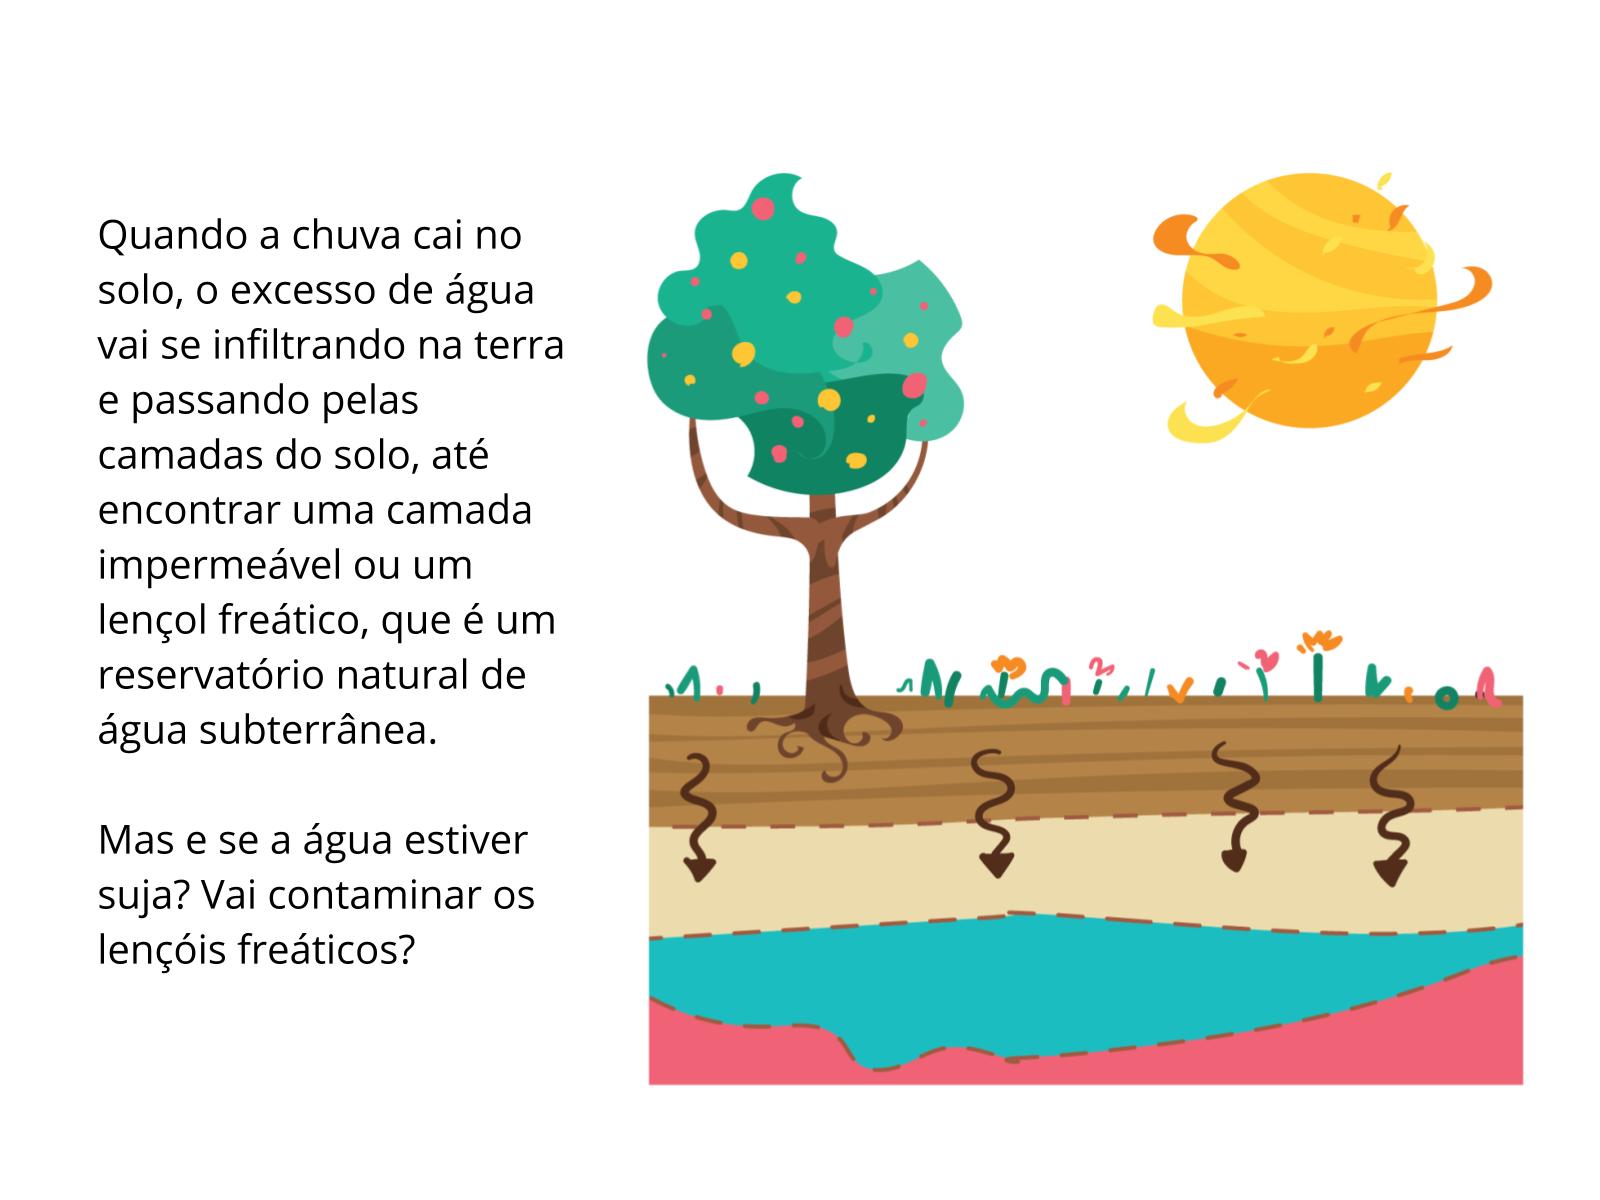 O solo é um filtro natural